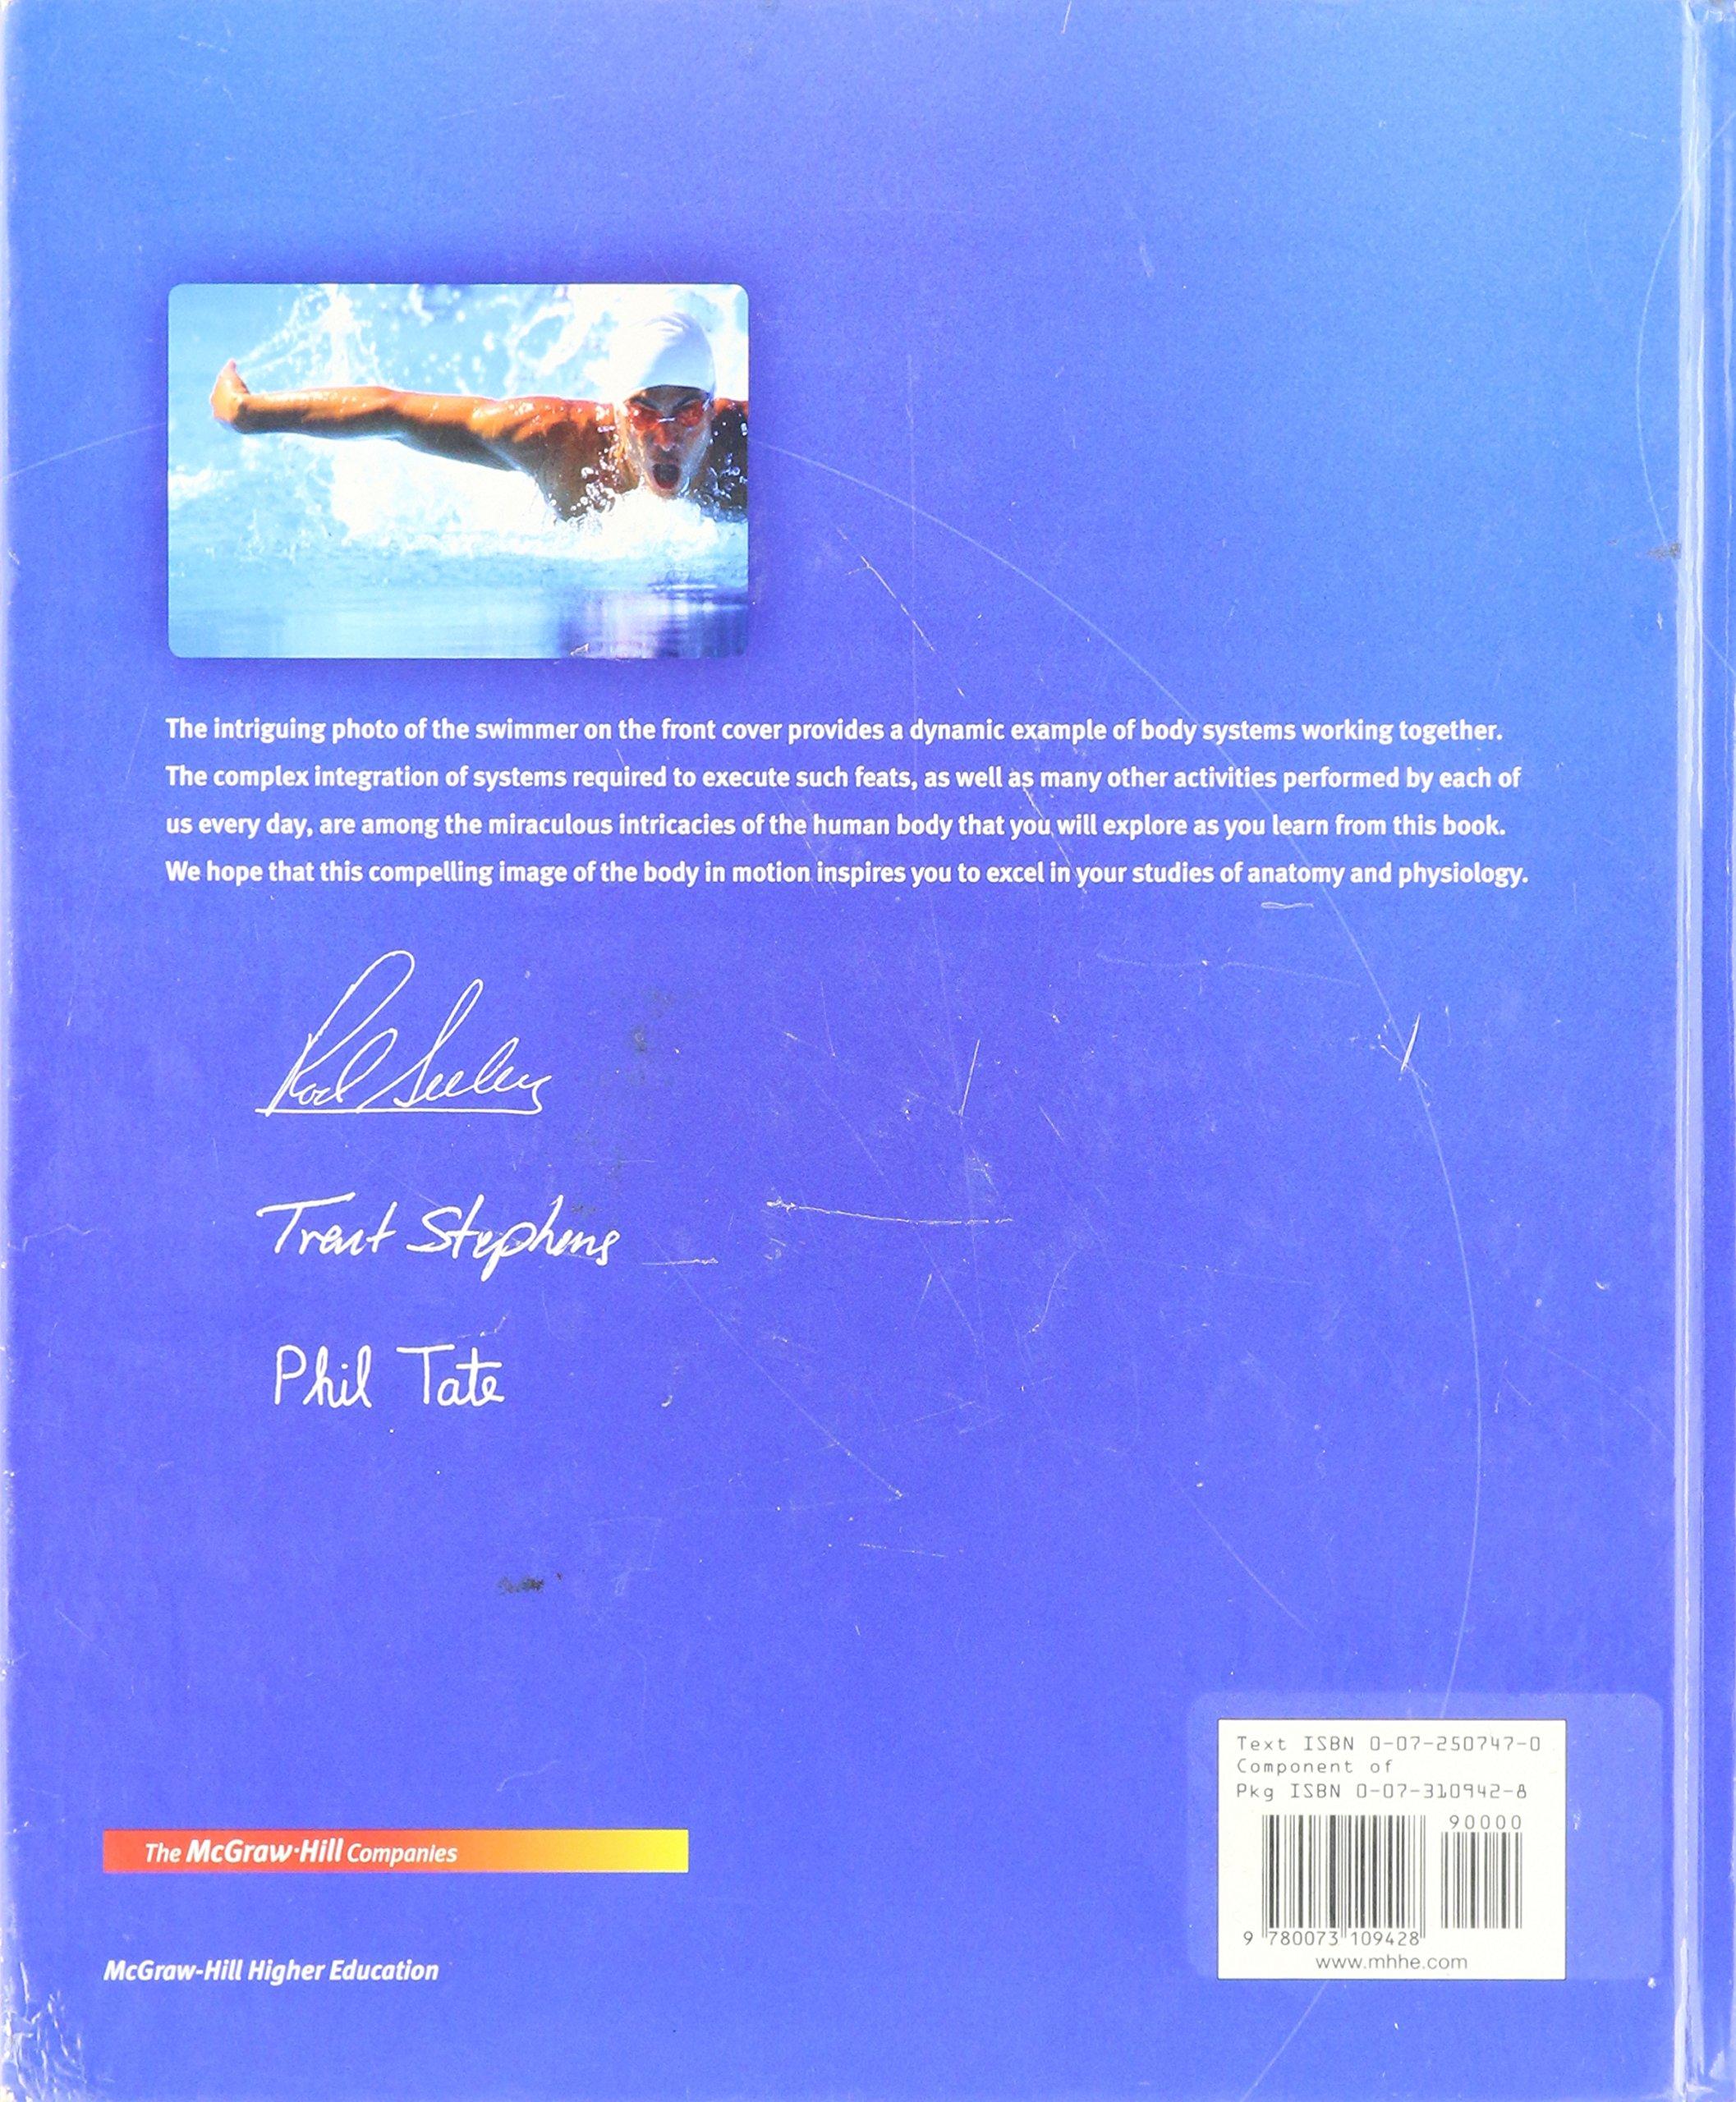 Anatomy & Physiology: Rodney R.; Stephens, Trent D.; Tate, Philip ...